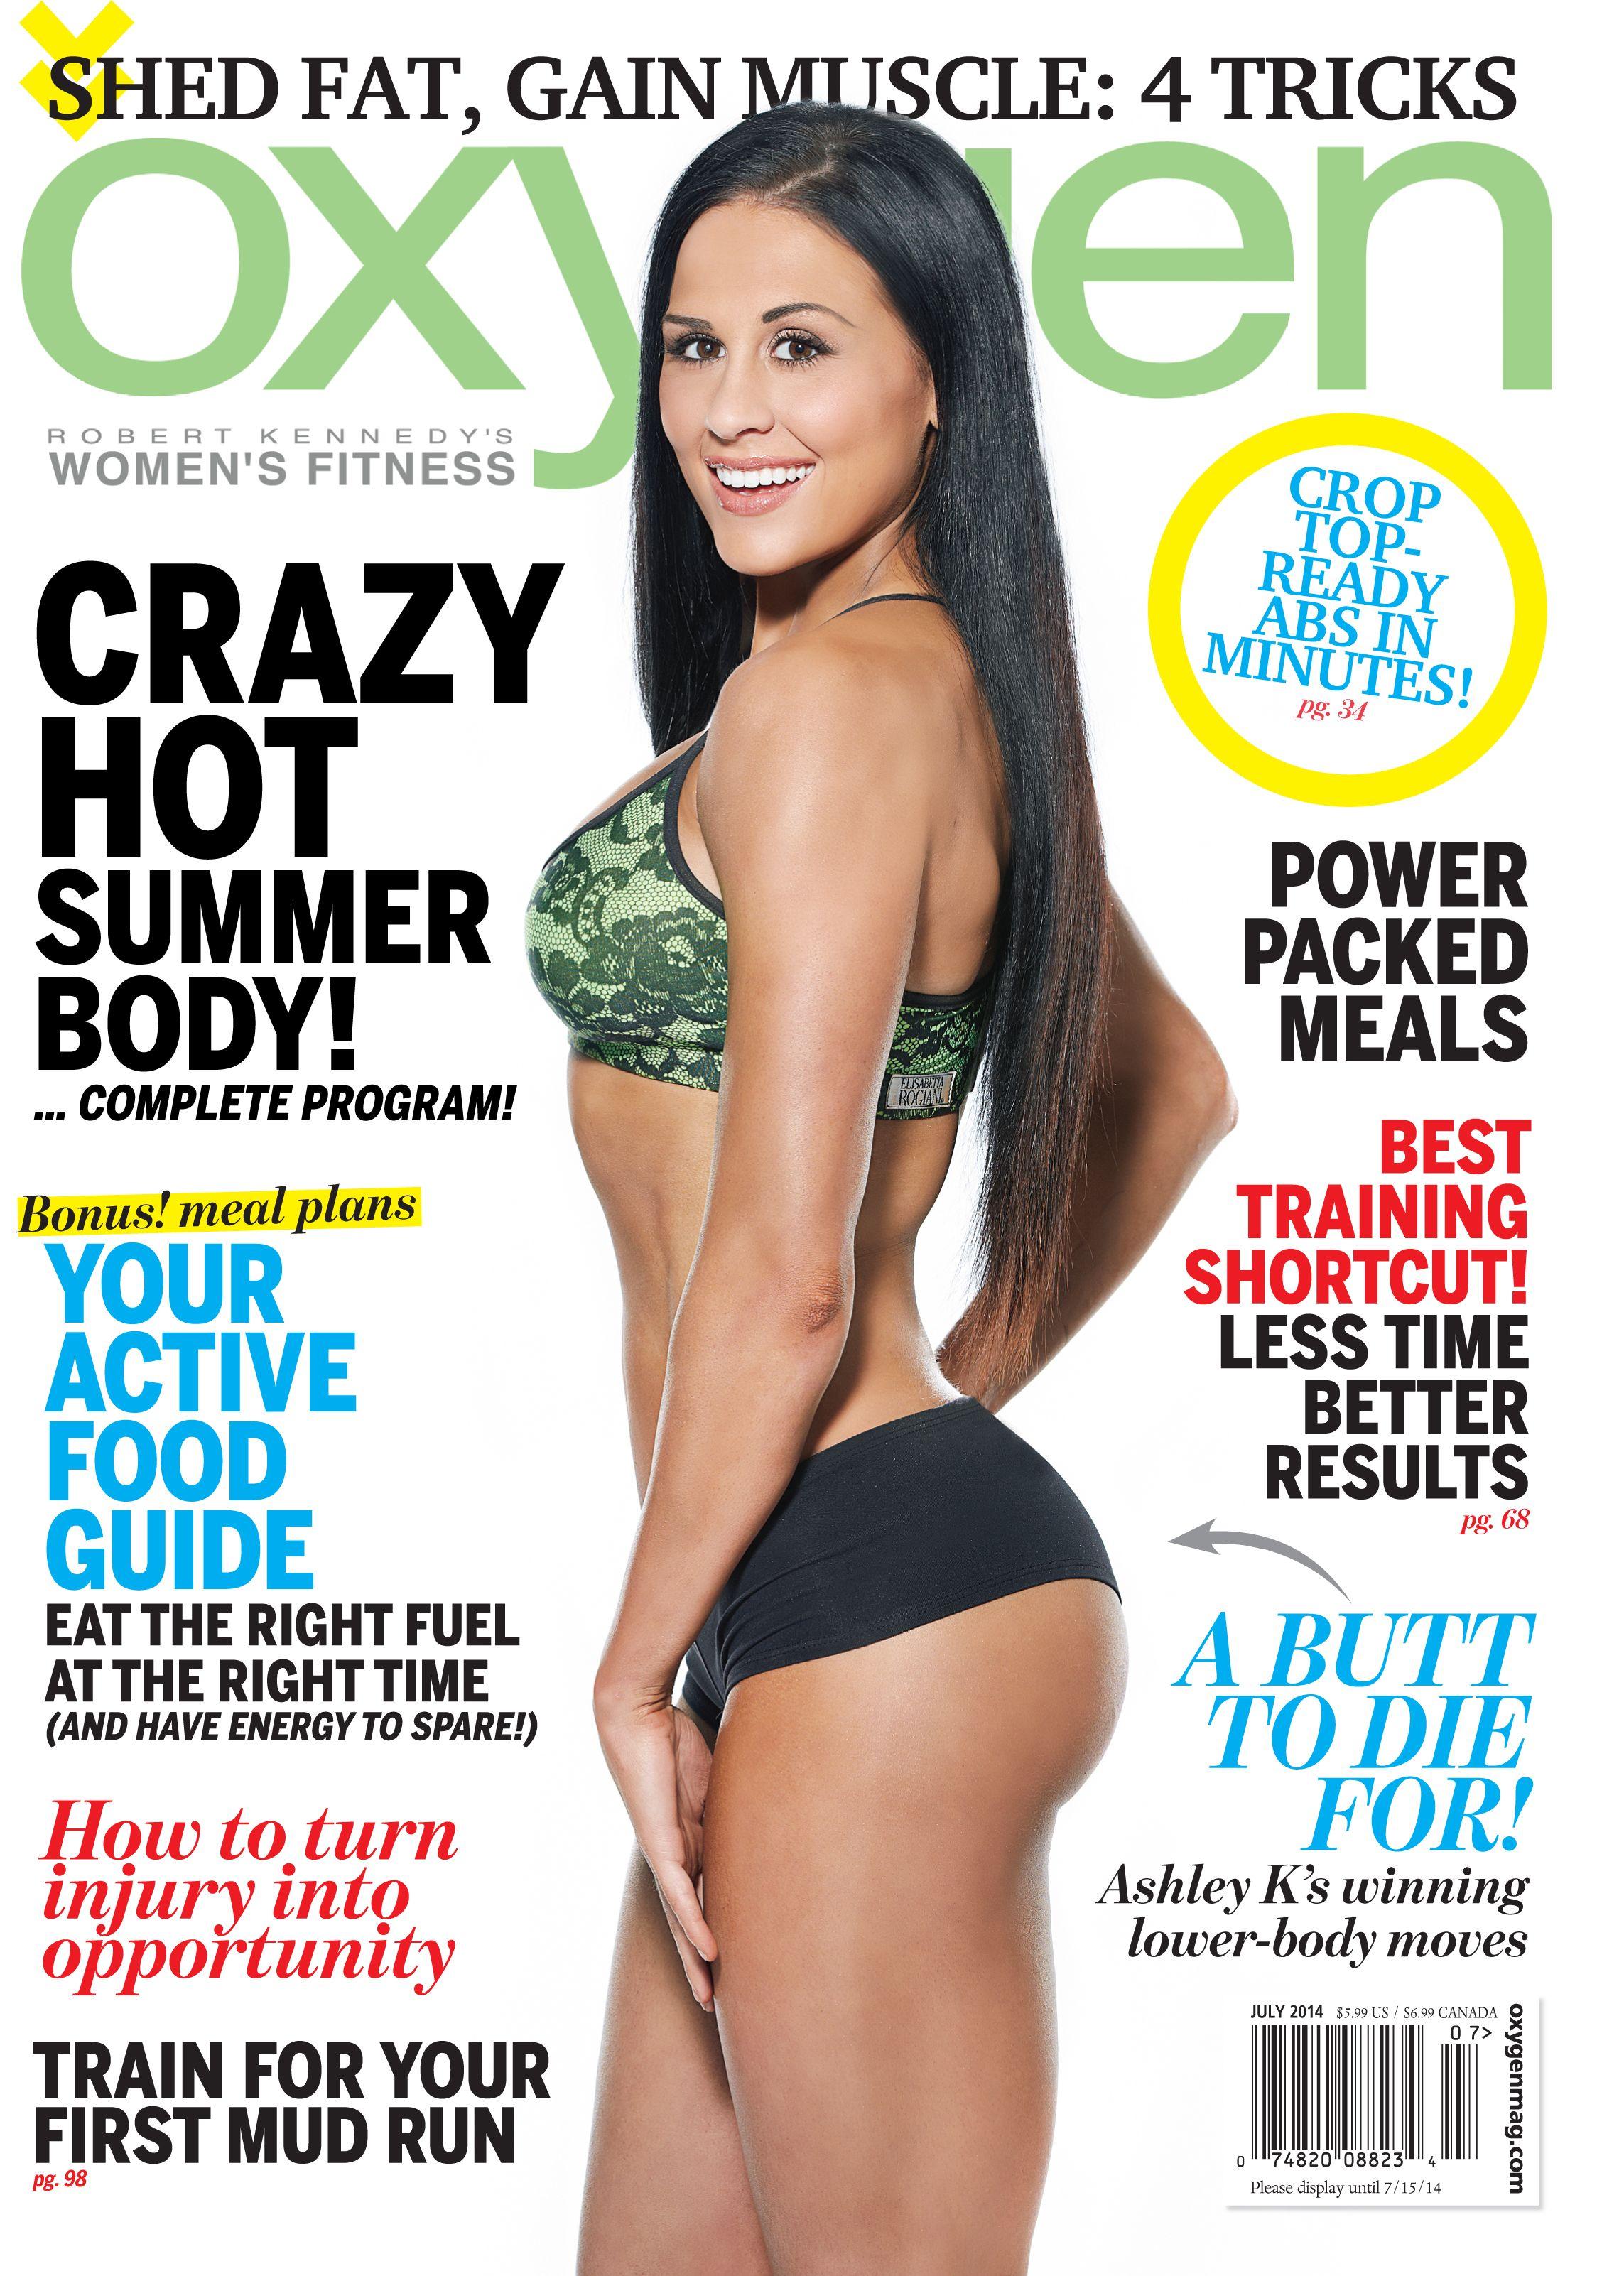 Oxygen July 2017 With Ashley Kaltwer Magazine Fitness 90 Day Challenge